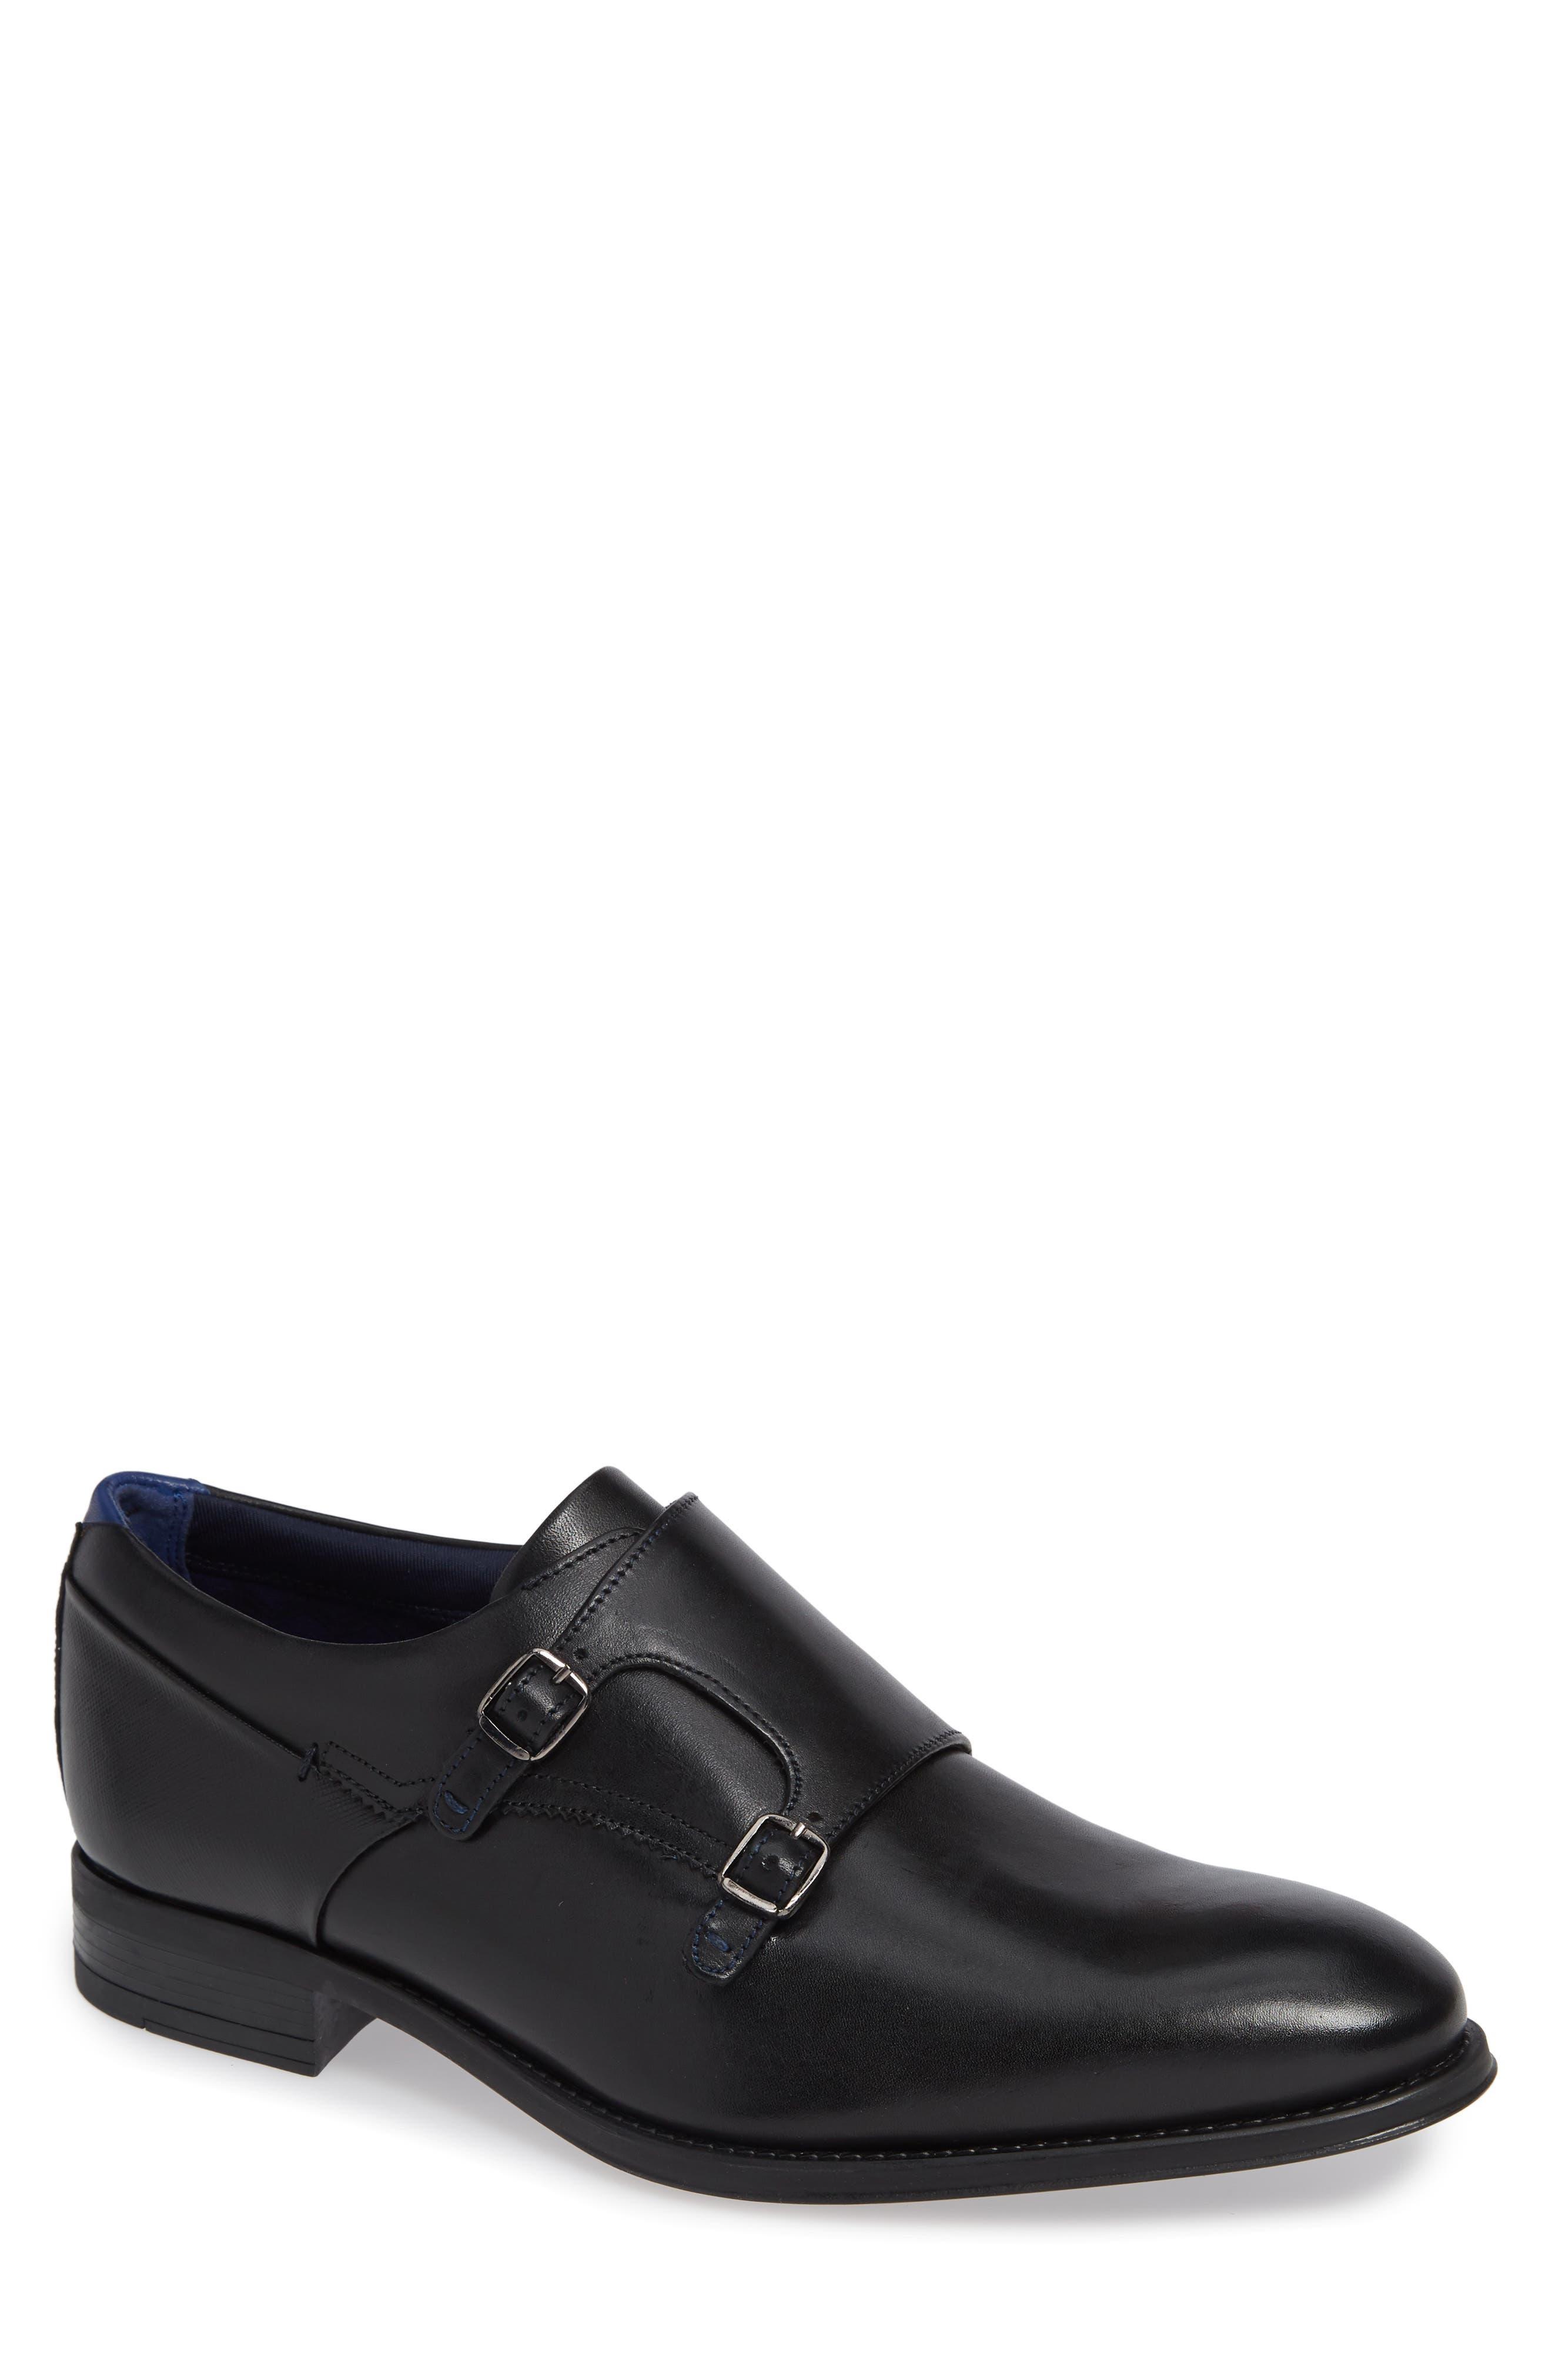 TED BAKER LONDON, Cathon Double Buckle Monk Shoe, Main thumbnail 1, color, BLACK LEATHER